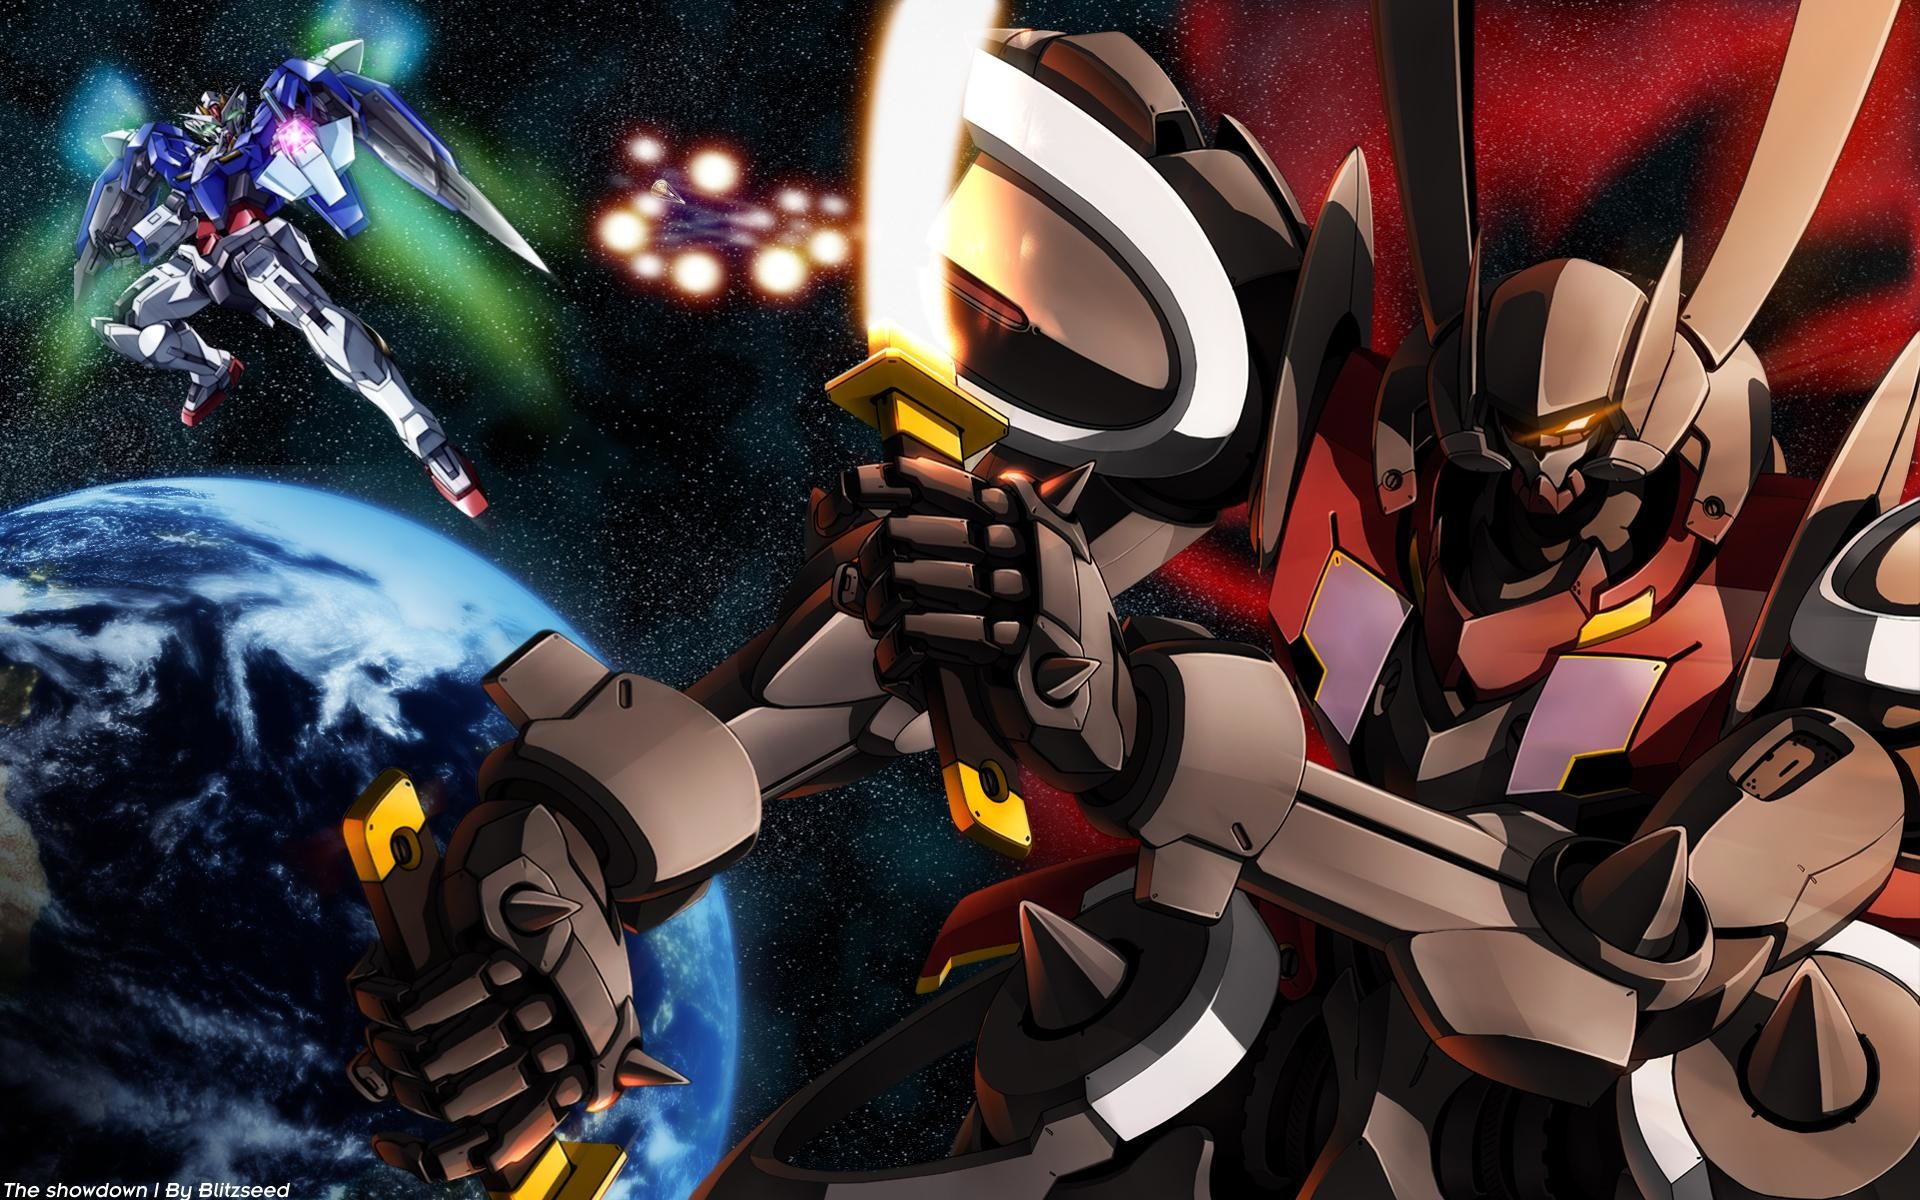 Gundam Wallpapers (65+ Images